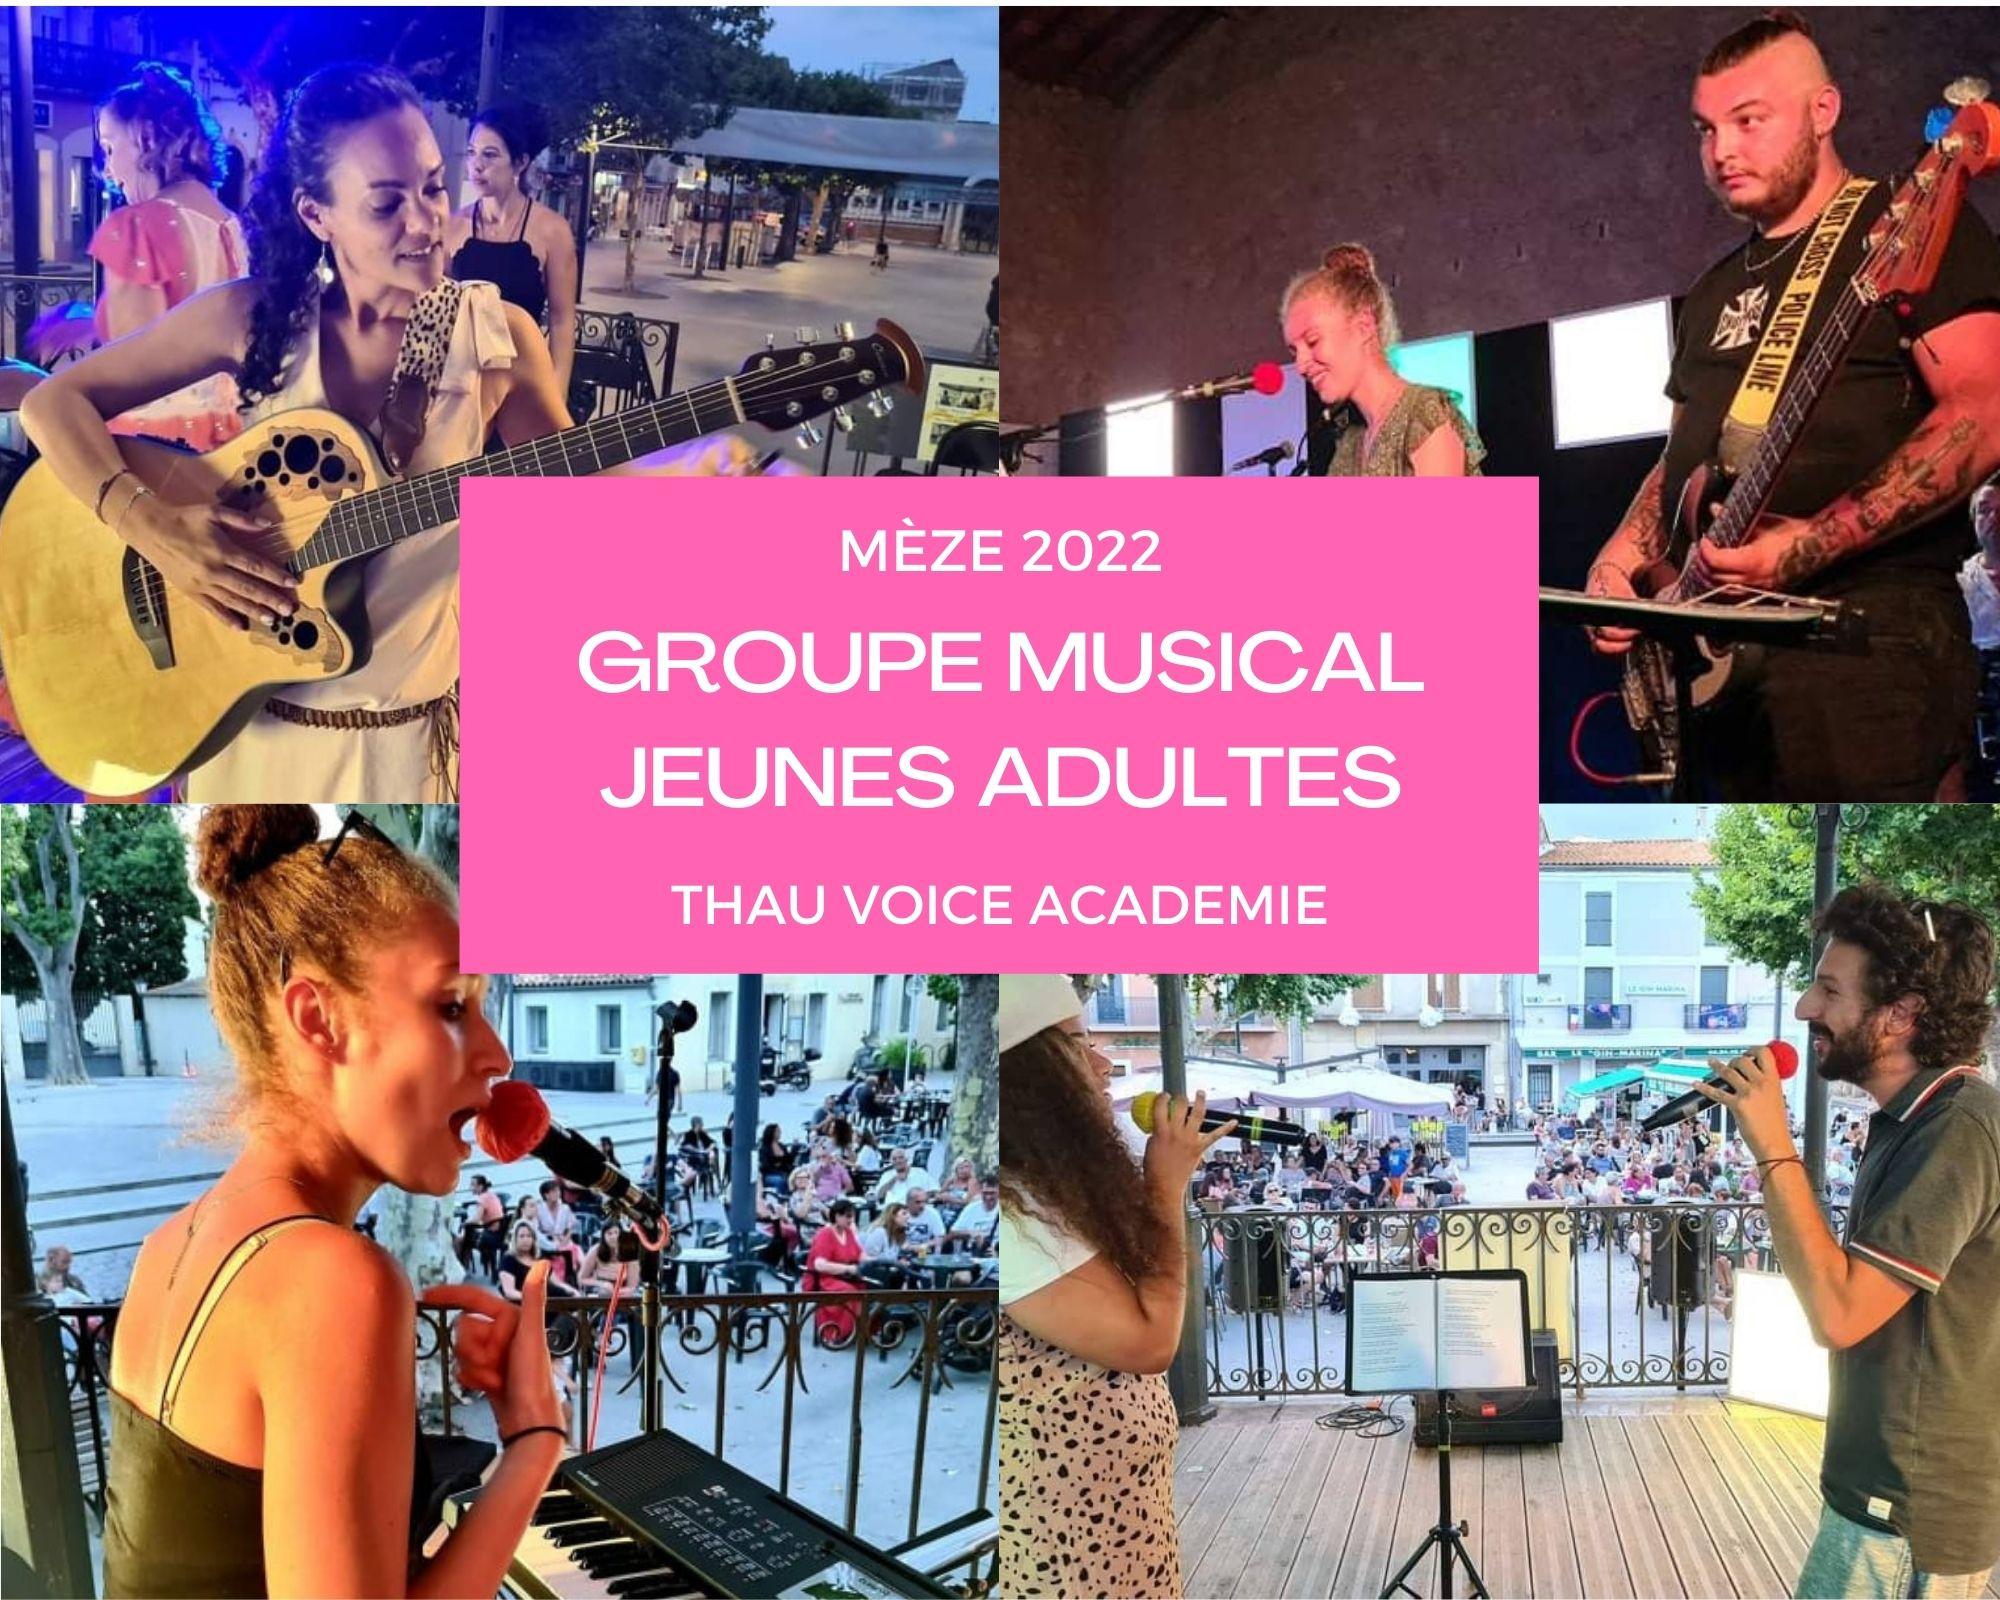 Groupe Musical Jeunes Adultes